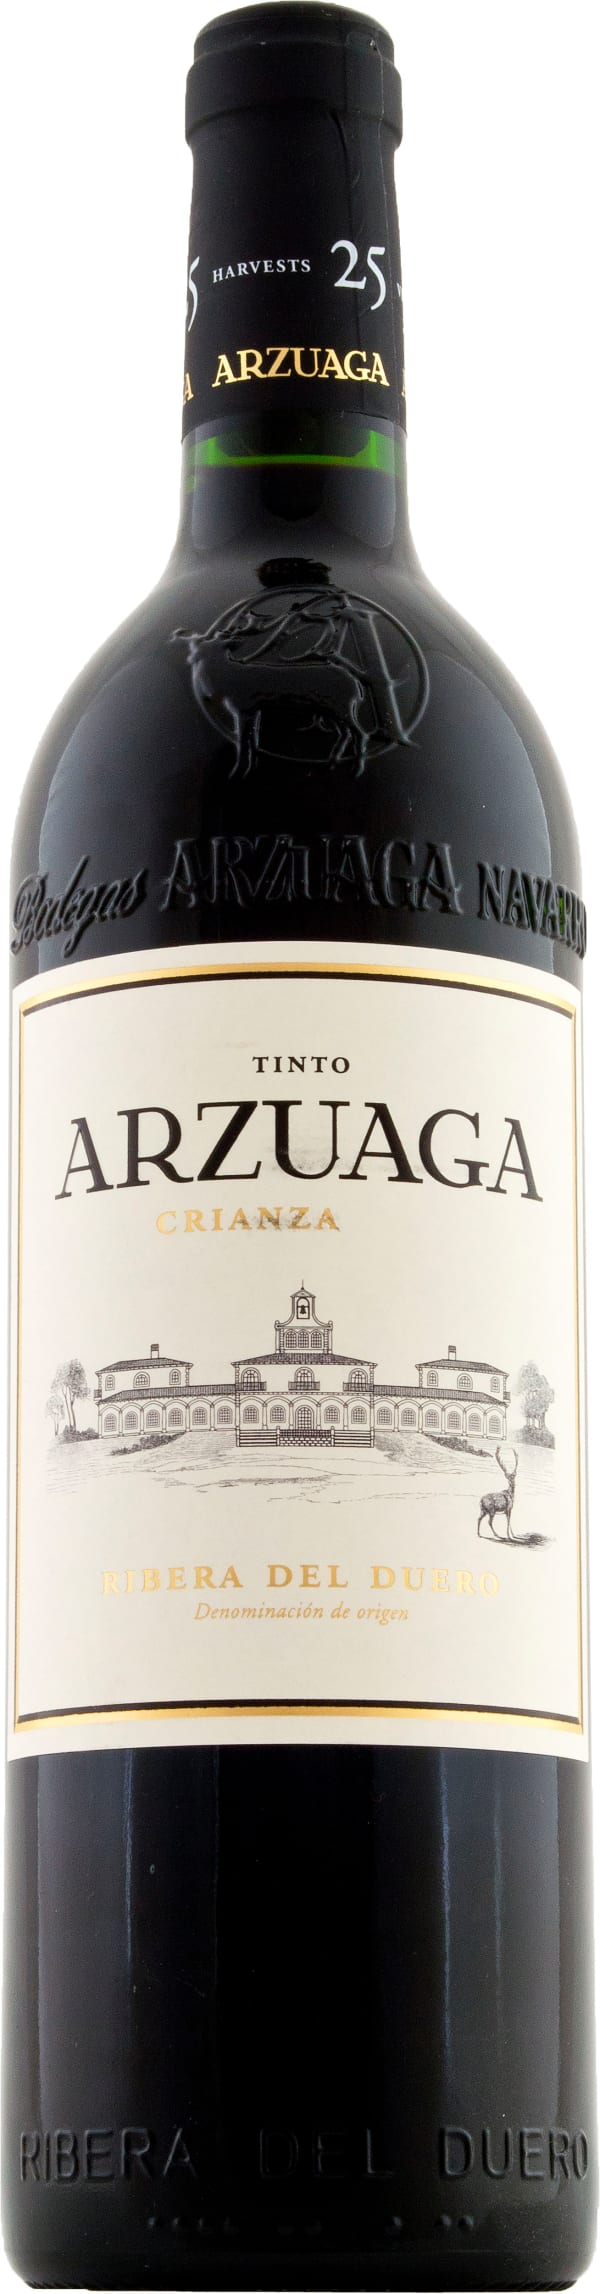 Arzuaga Crianza 2015